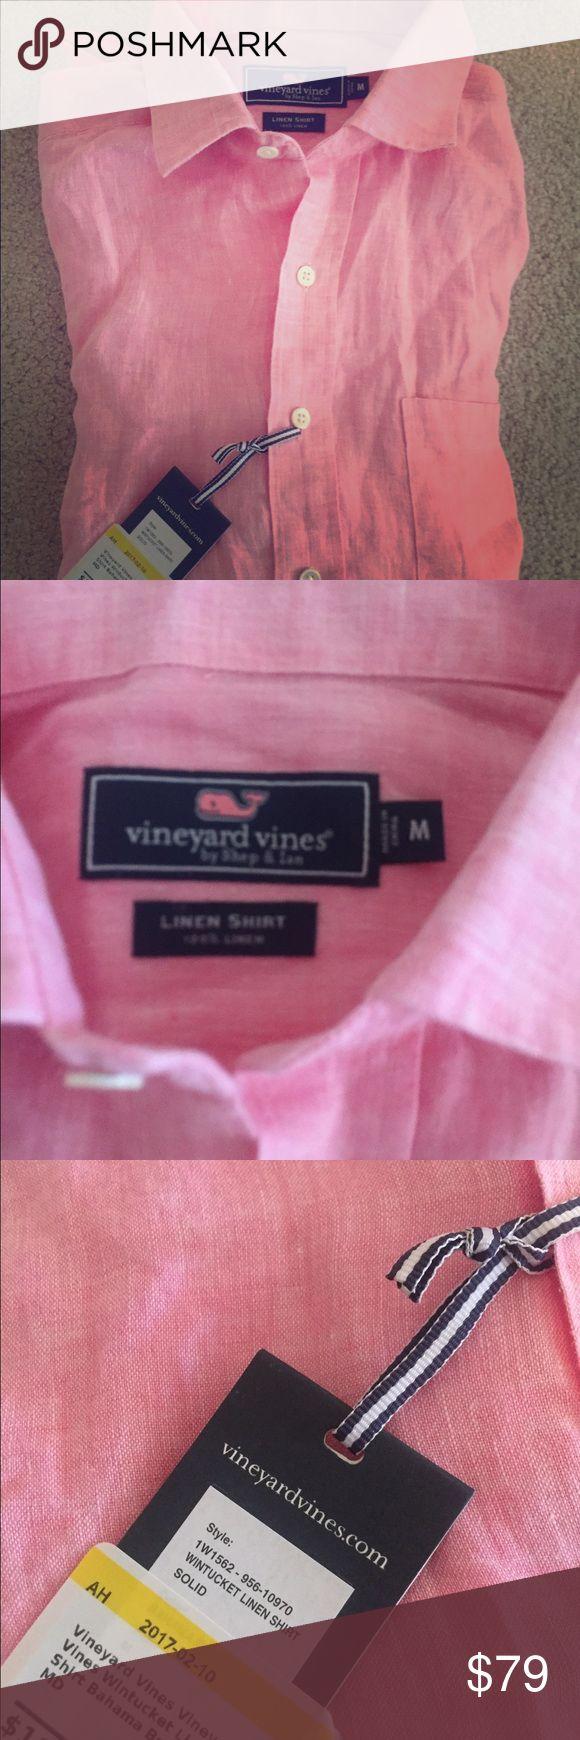 NWT vineyard vines wintucket linen shirt medium Gorgeous linen shirt! New with tags :). Size medium men's. Bahamas breeze color. Vineyard Vines Shirts Casual Button Down Shirts